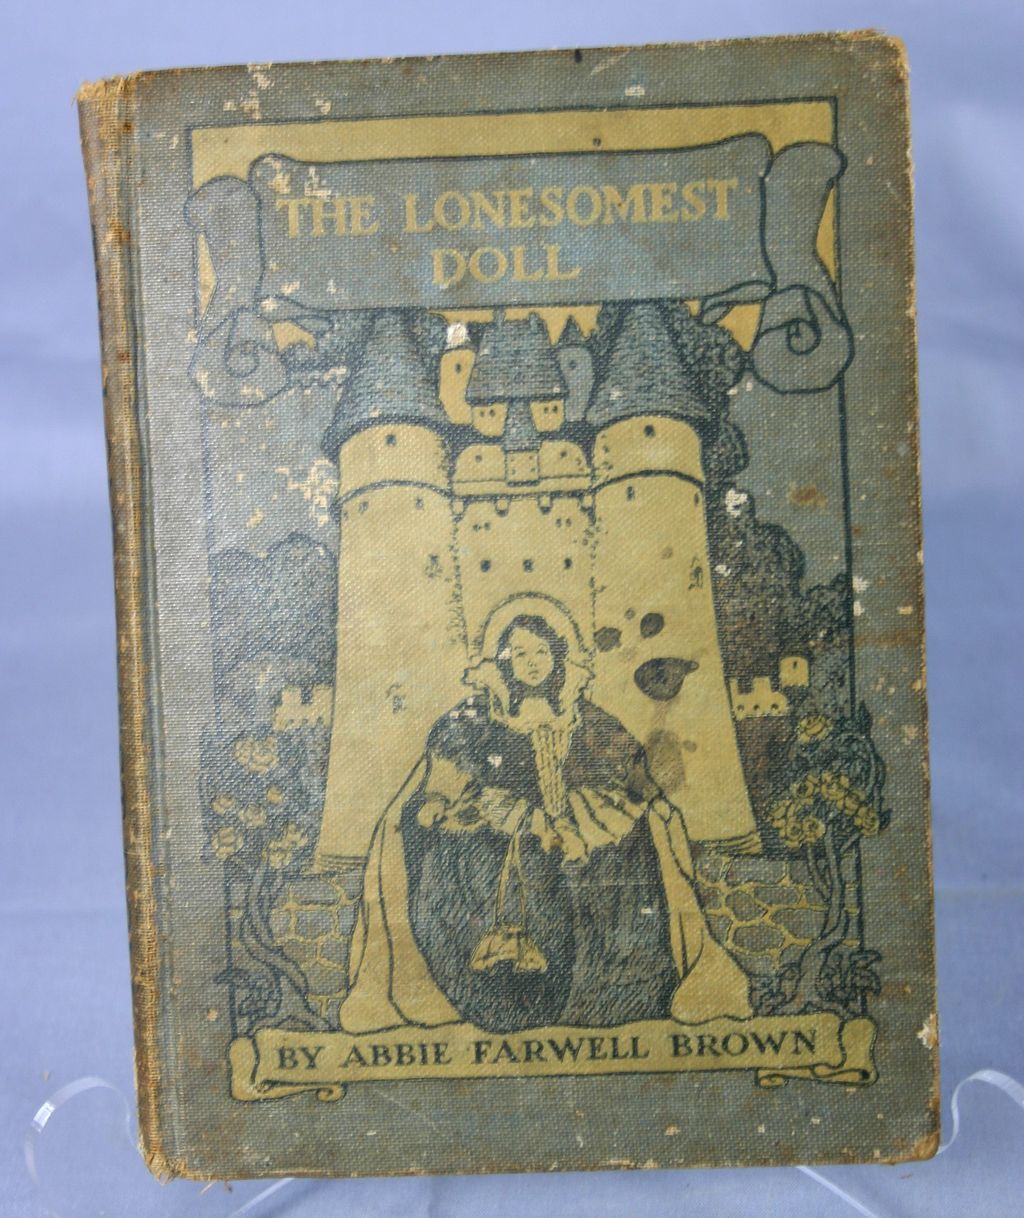 The Lonesomest Doll Abbie Farwell Brown, Illustr. E. Pollak 1901